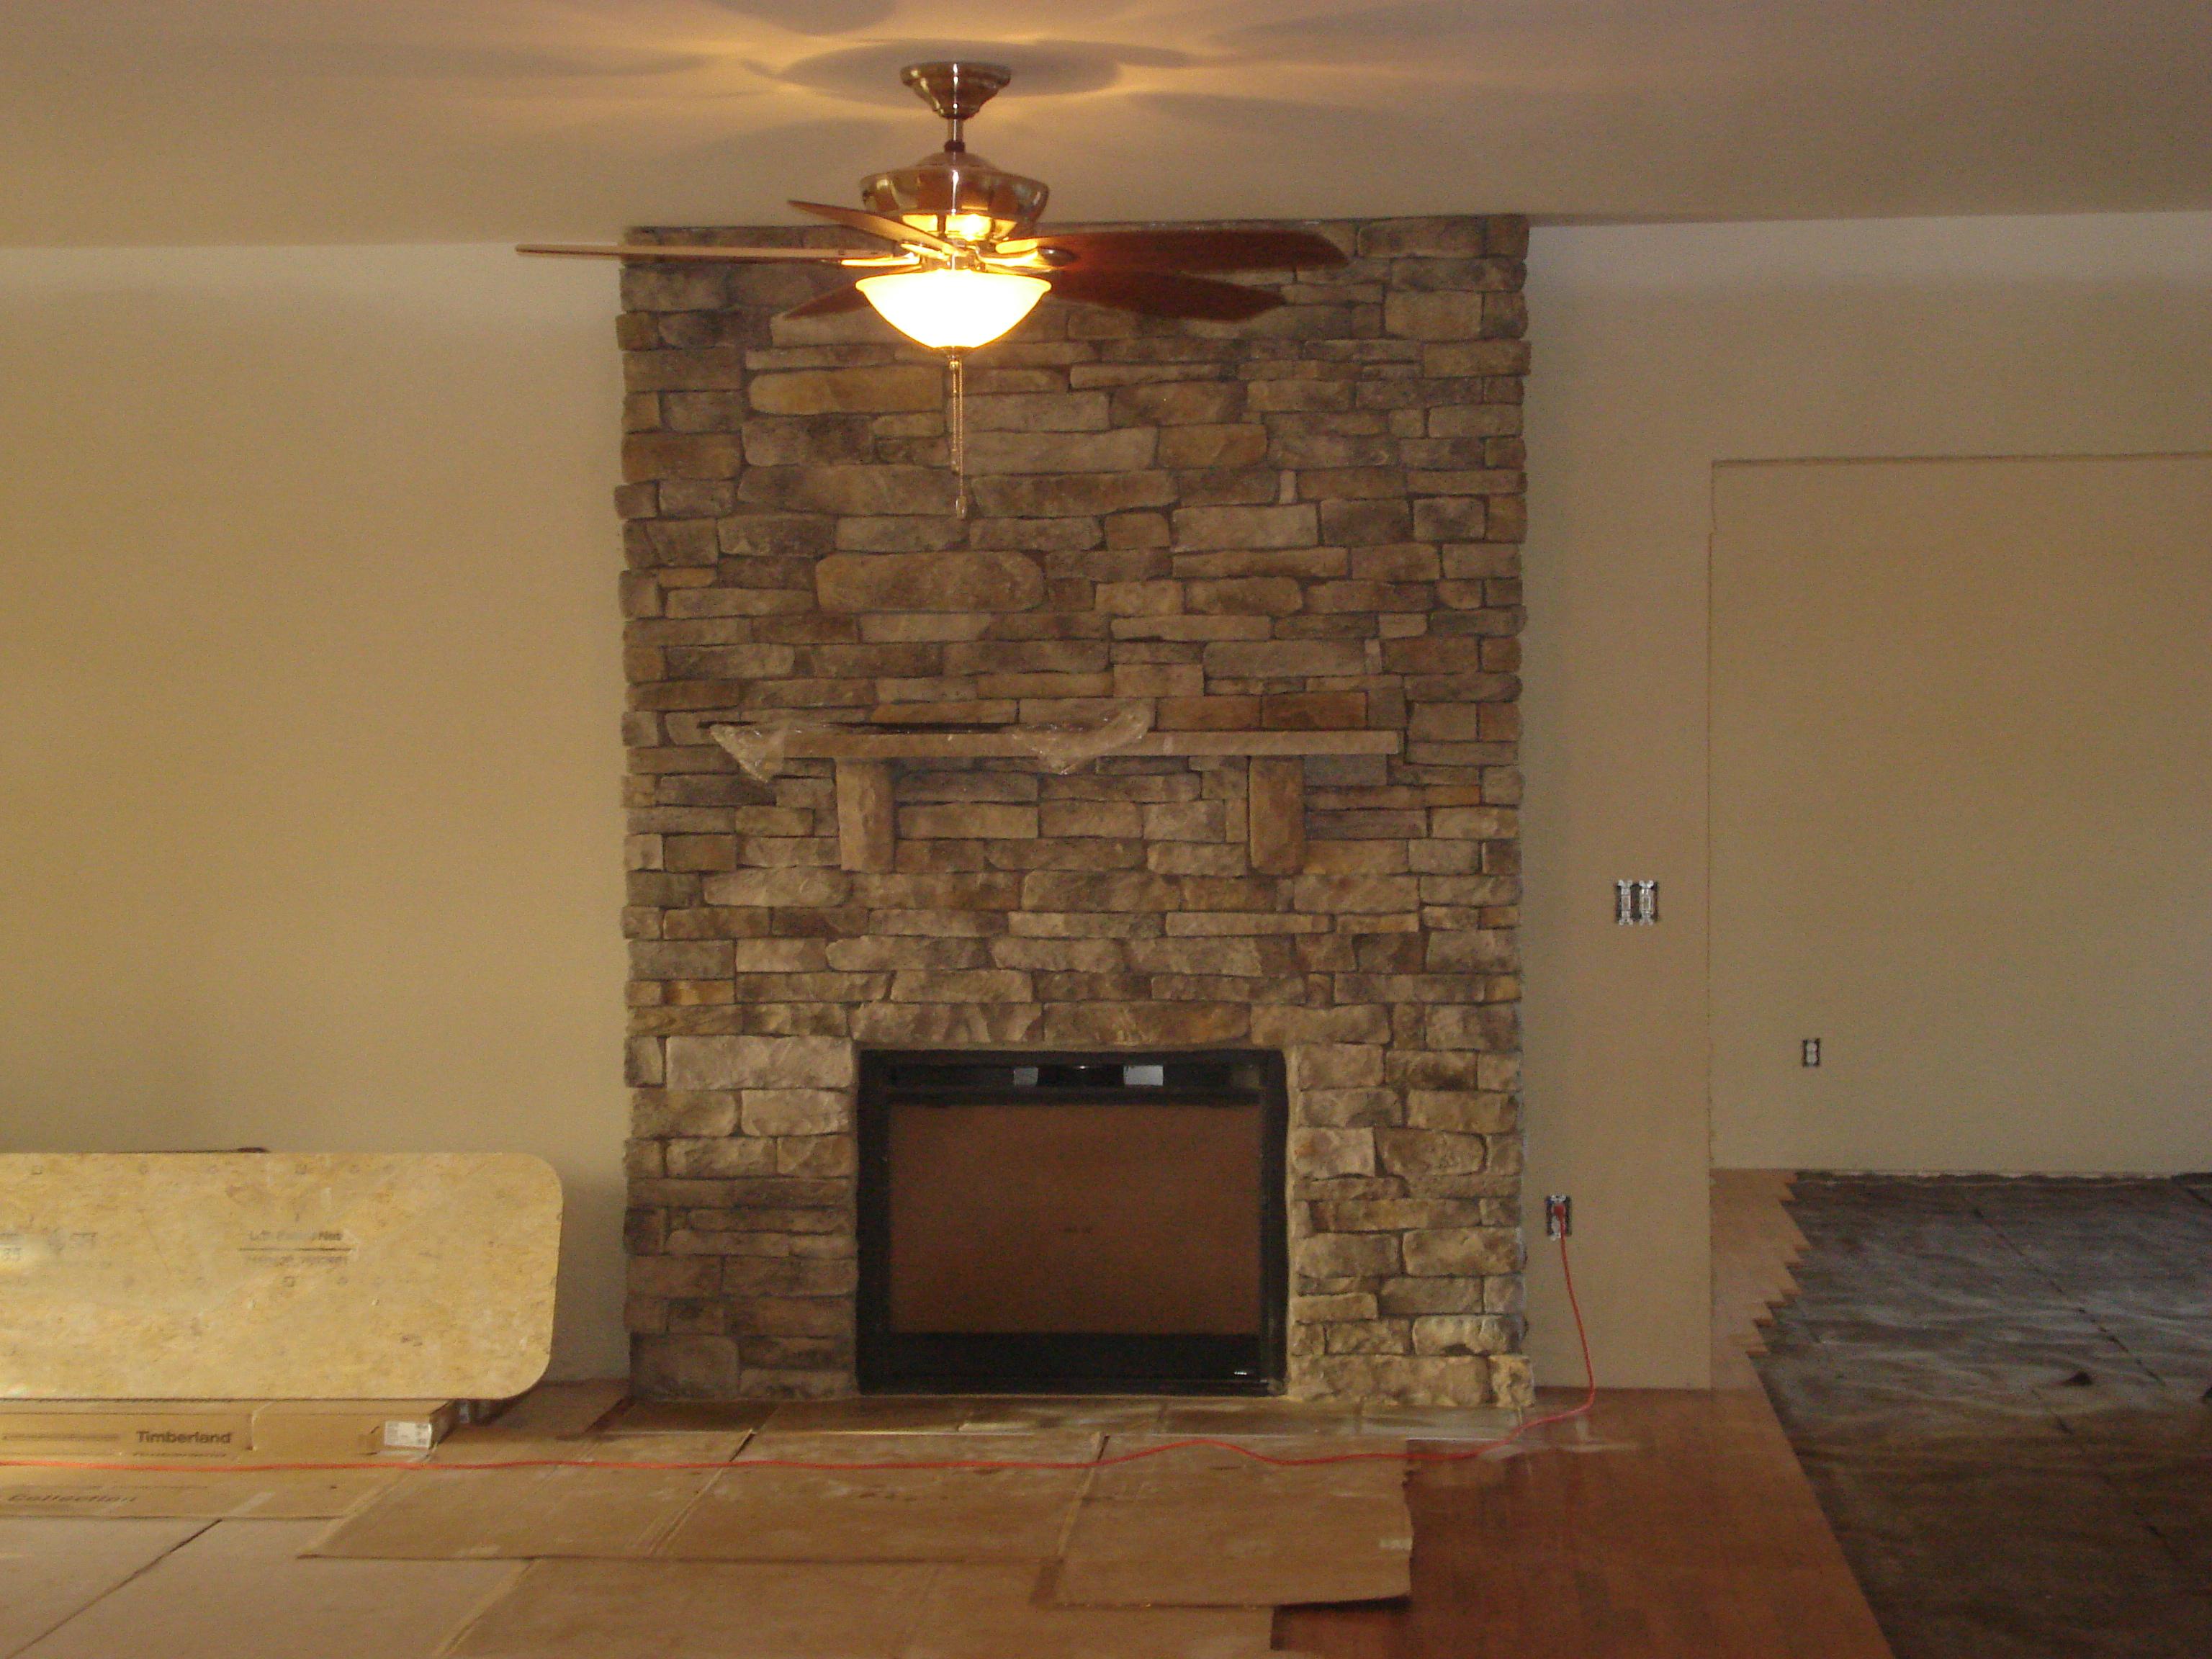 glick's fireplace